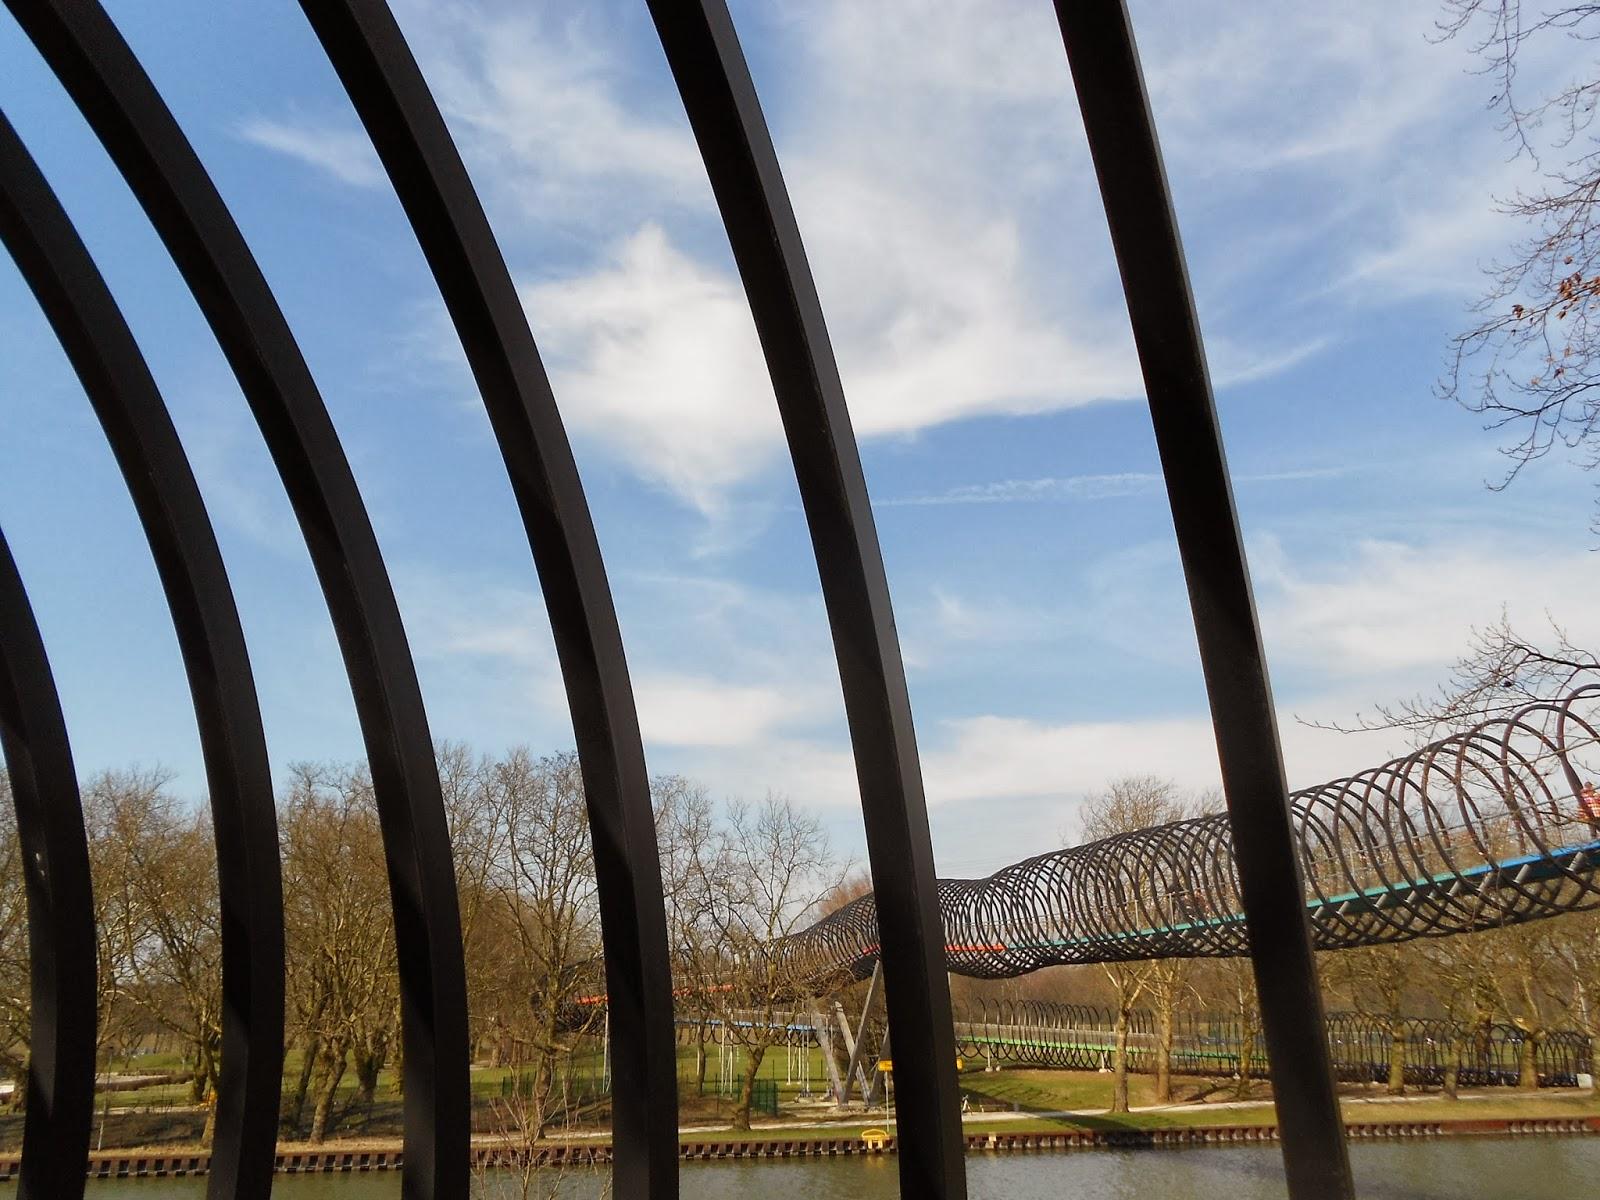 Brücke Slinky Springs To Fame in Oberhausen bei bestem Frühlingswetter